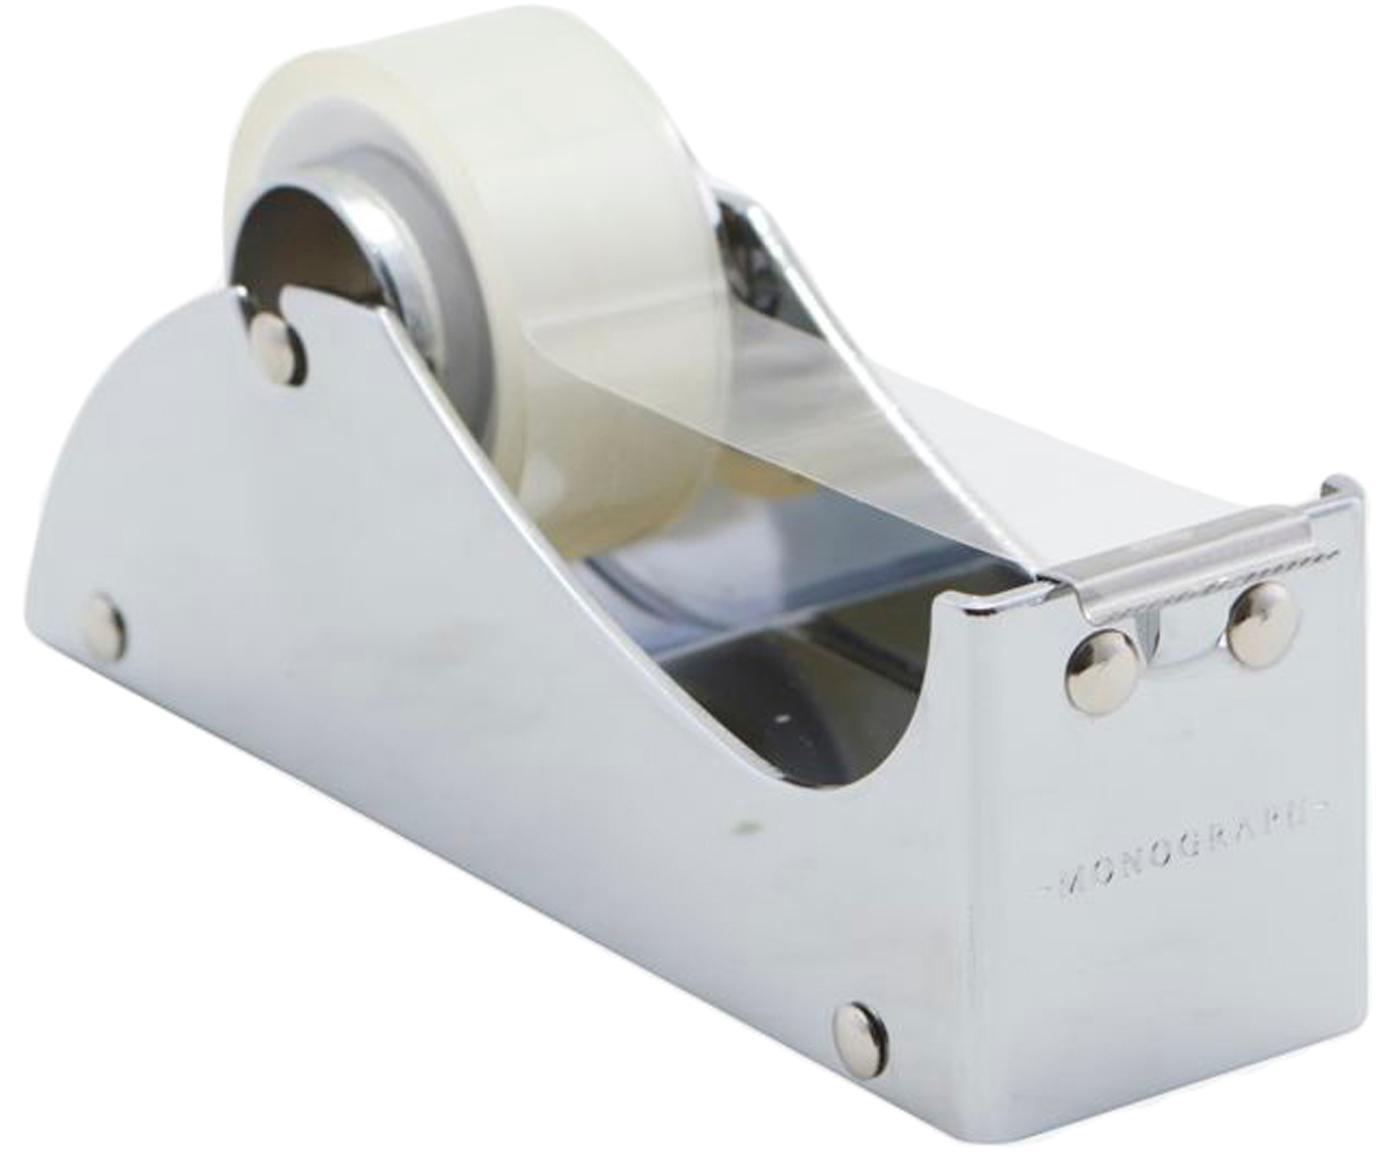 Dispenser per nastro adesivo Siba, Metallo, Argentato, Larg. 13 x Alt. 5 cm